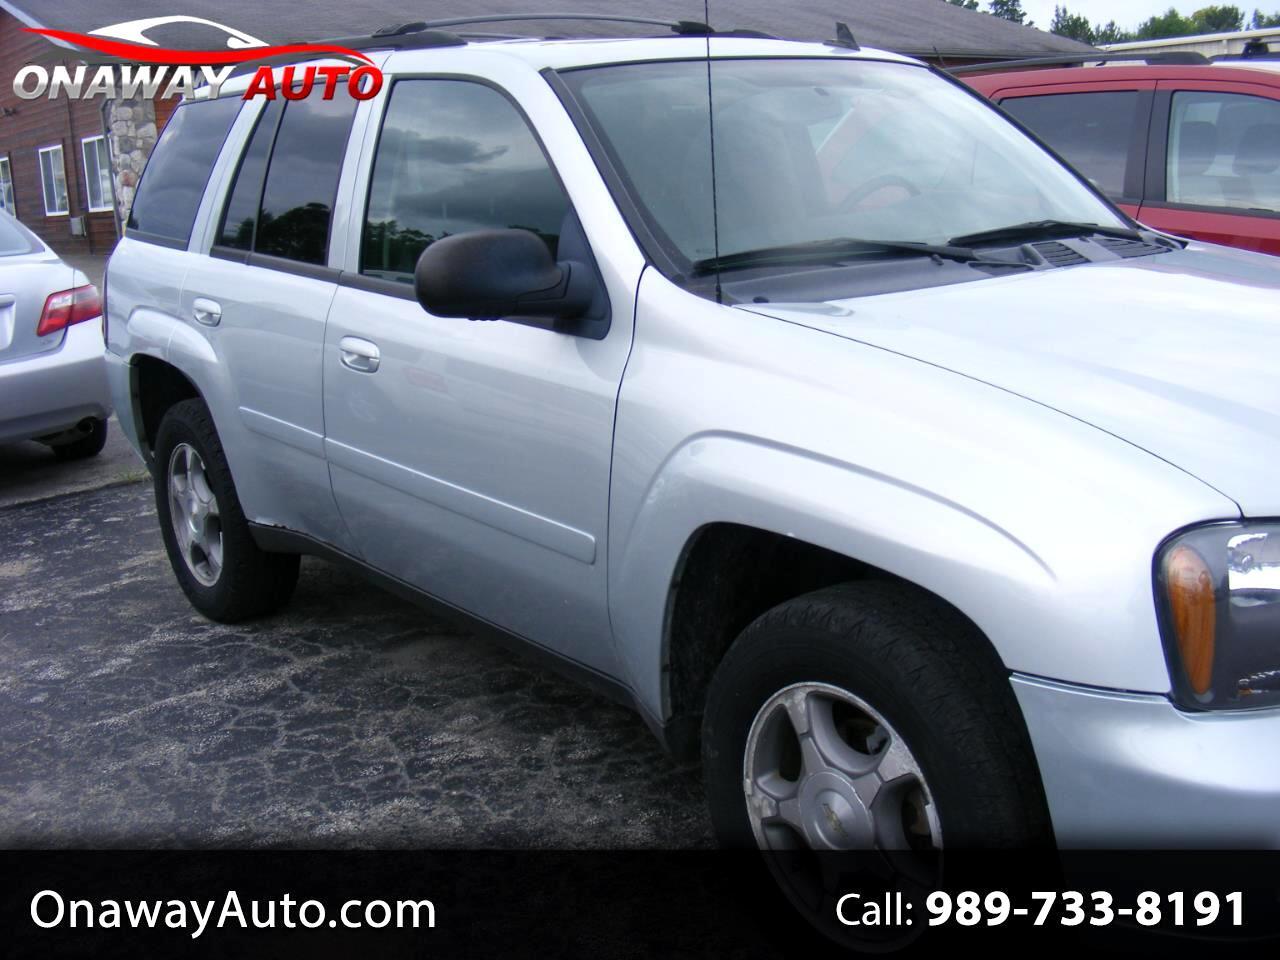 2008 Chevrolet TrailBlazer 4WD 4dr LT w/1LT